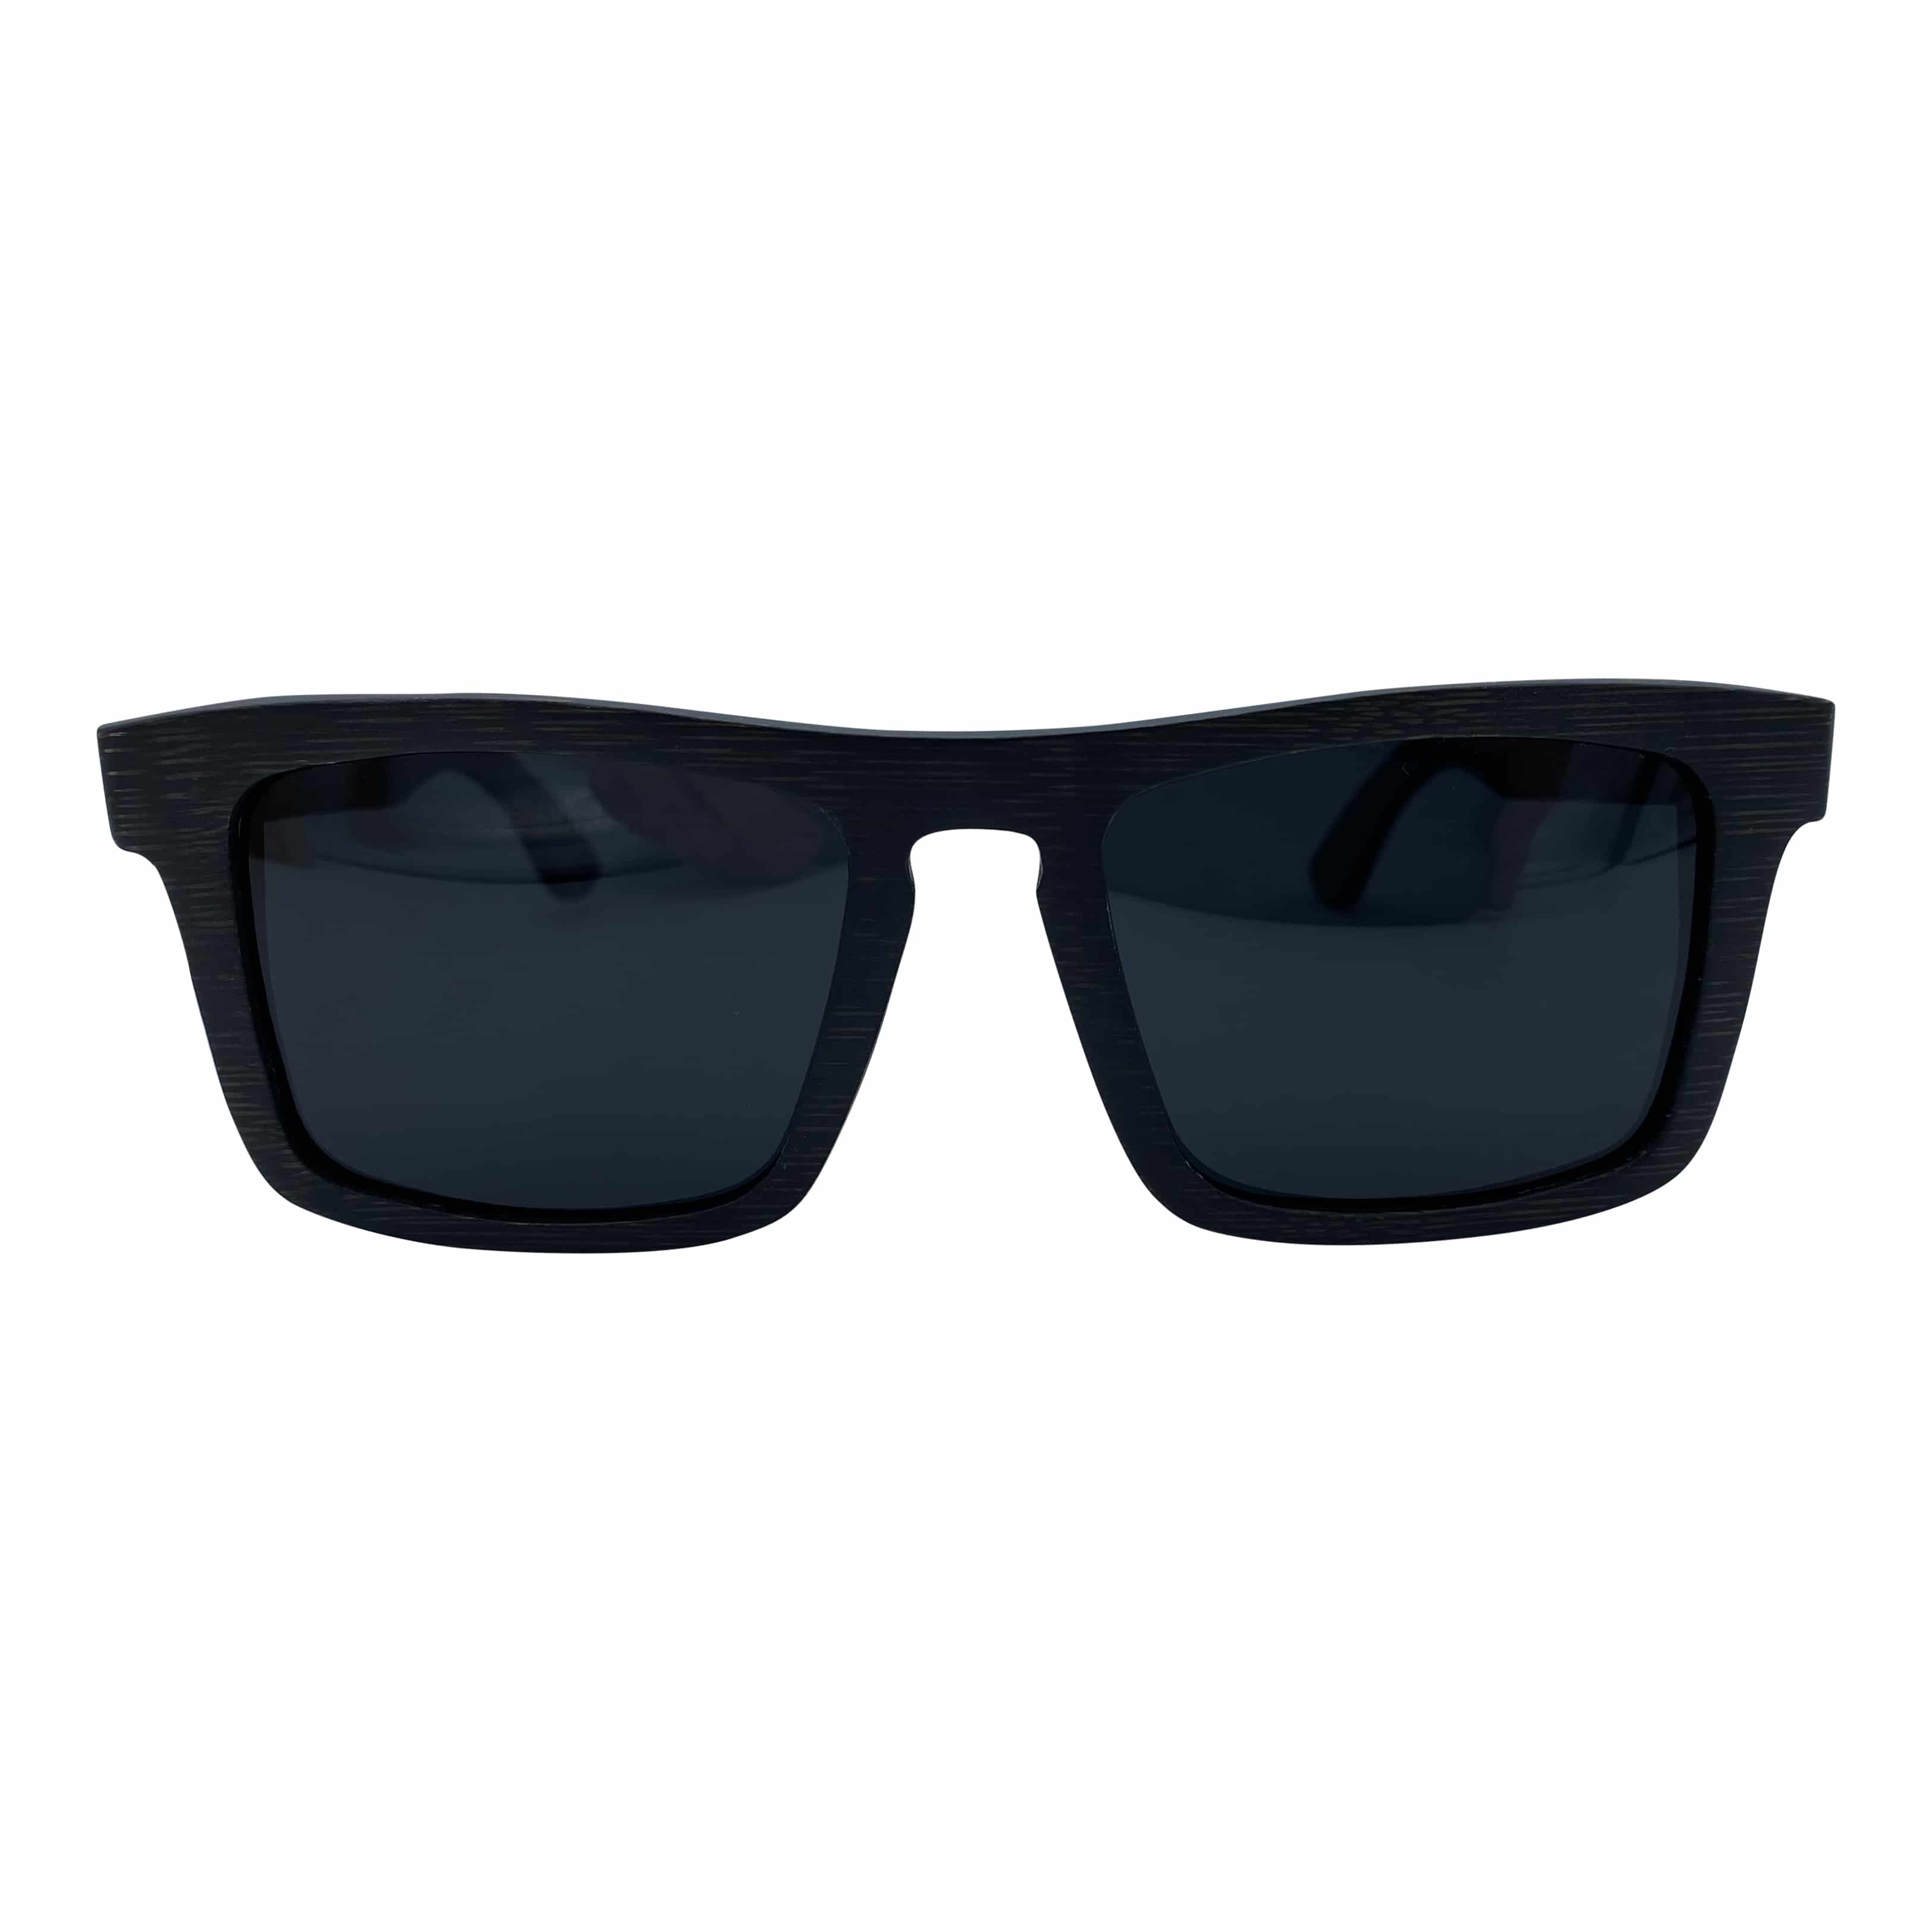 5one® Boston zwart bamboo houten zonnebril met zwarte lenzen